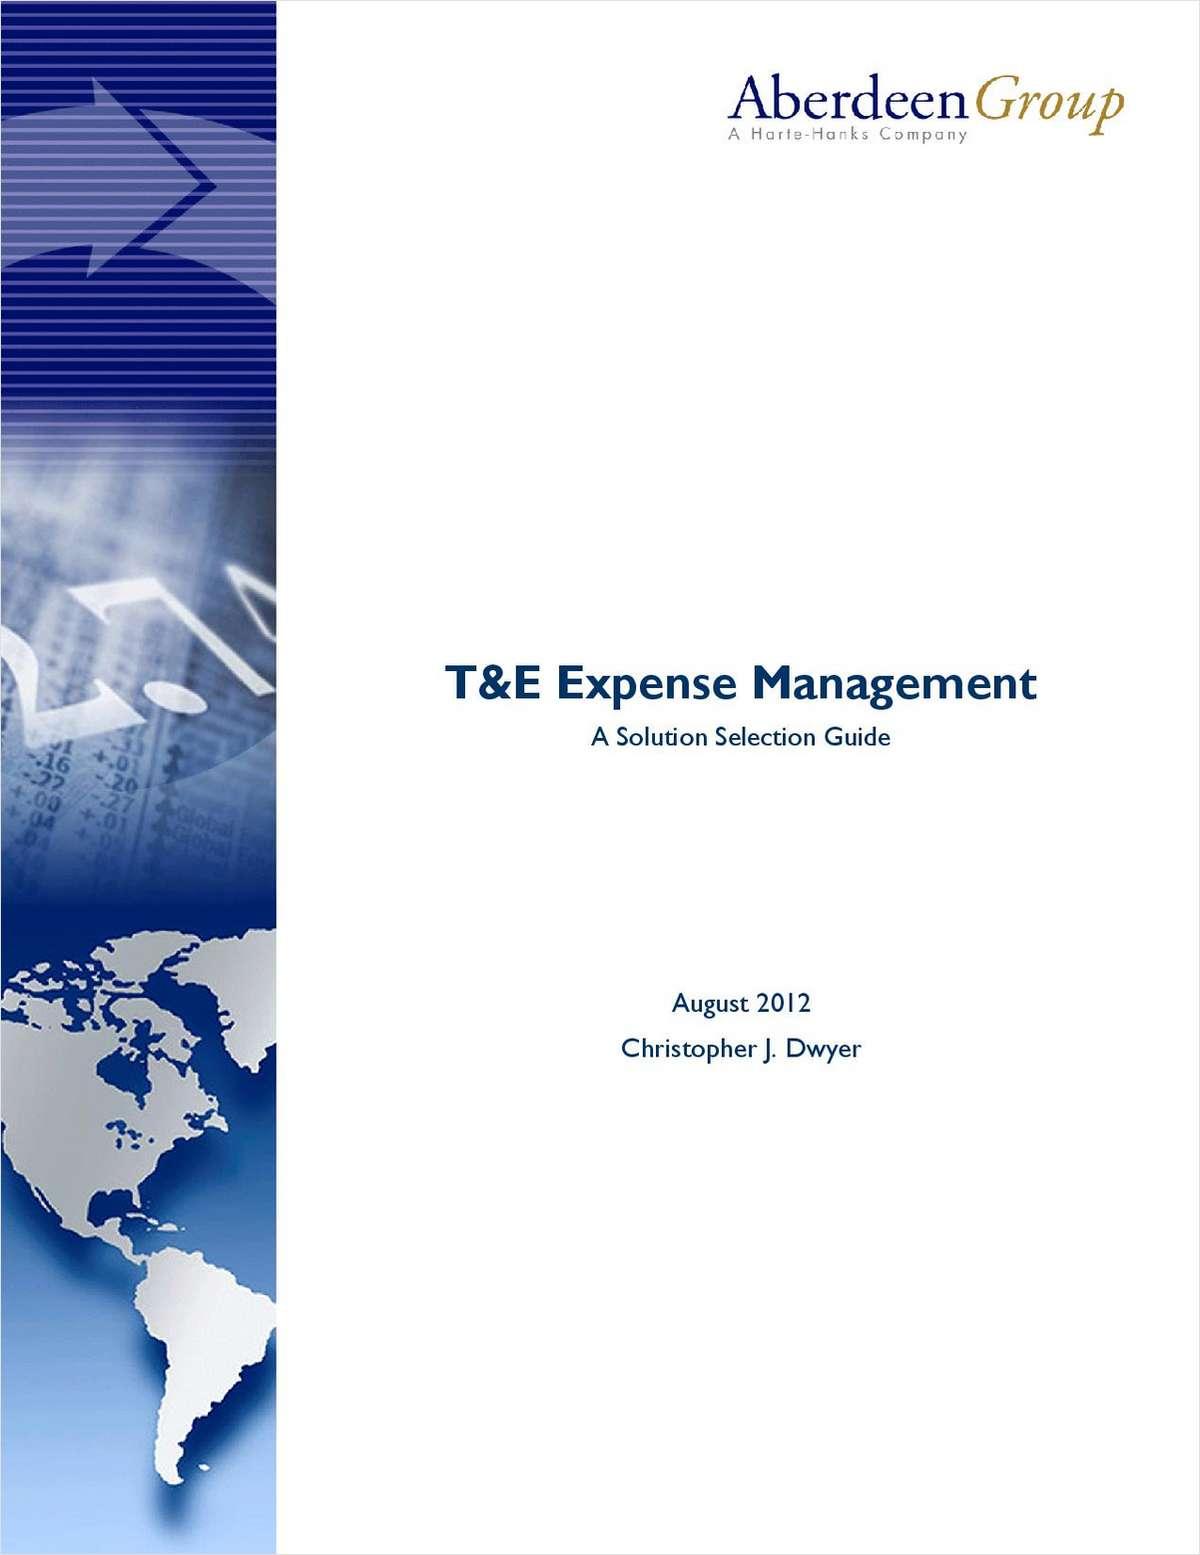 T&E Expense Management: A Solution Selection Guide